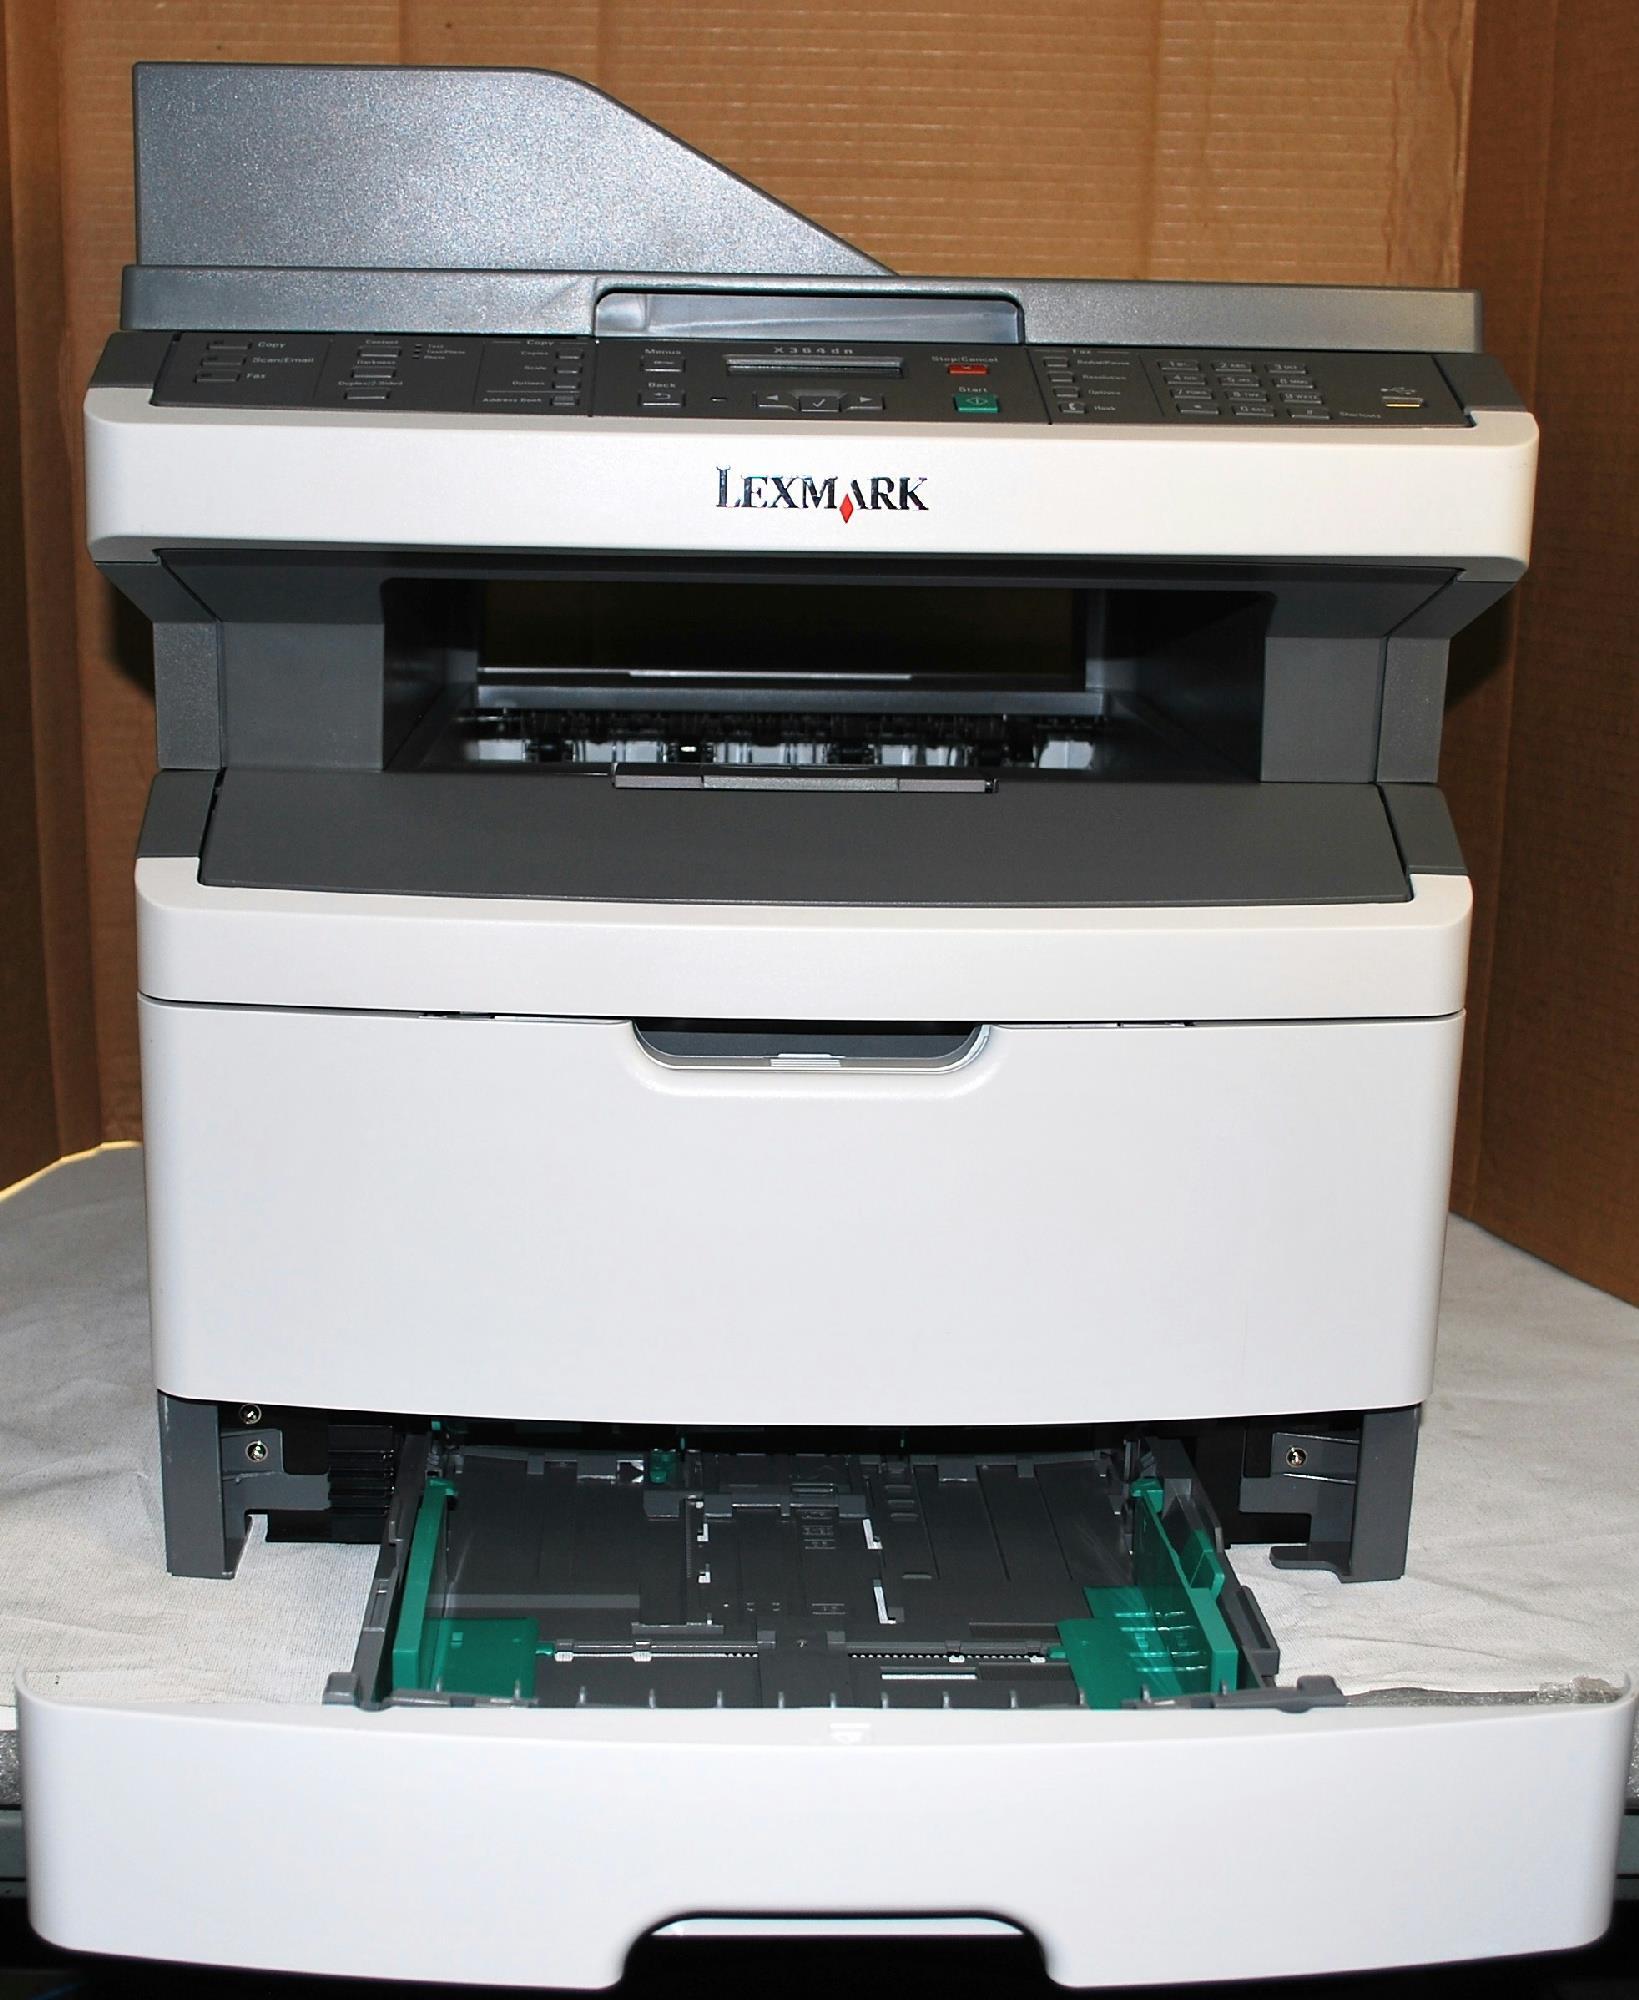 Lexmark MB2236adw firmware error 900